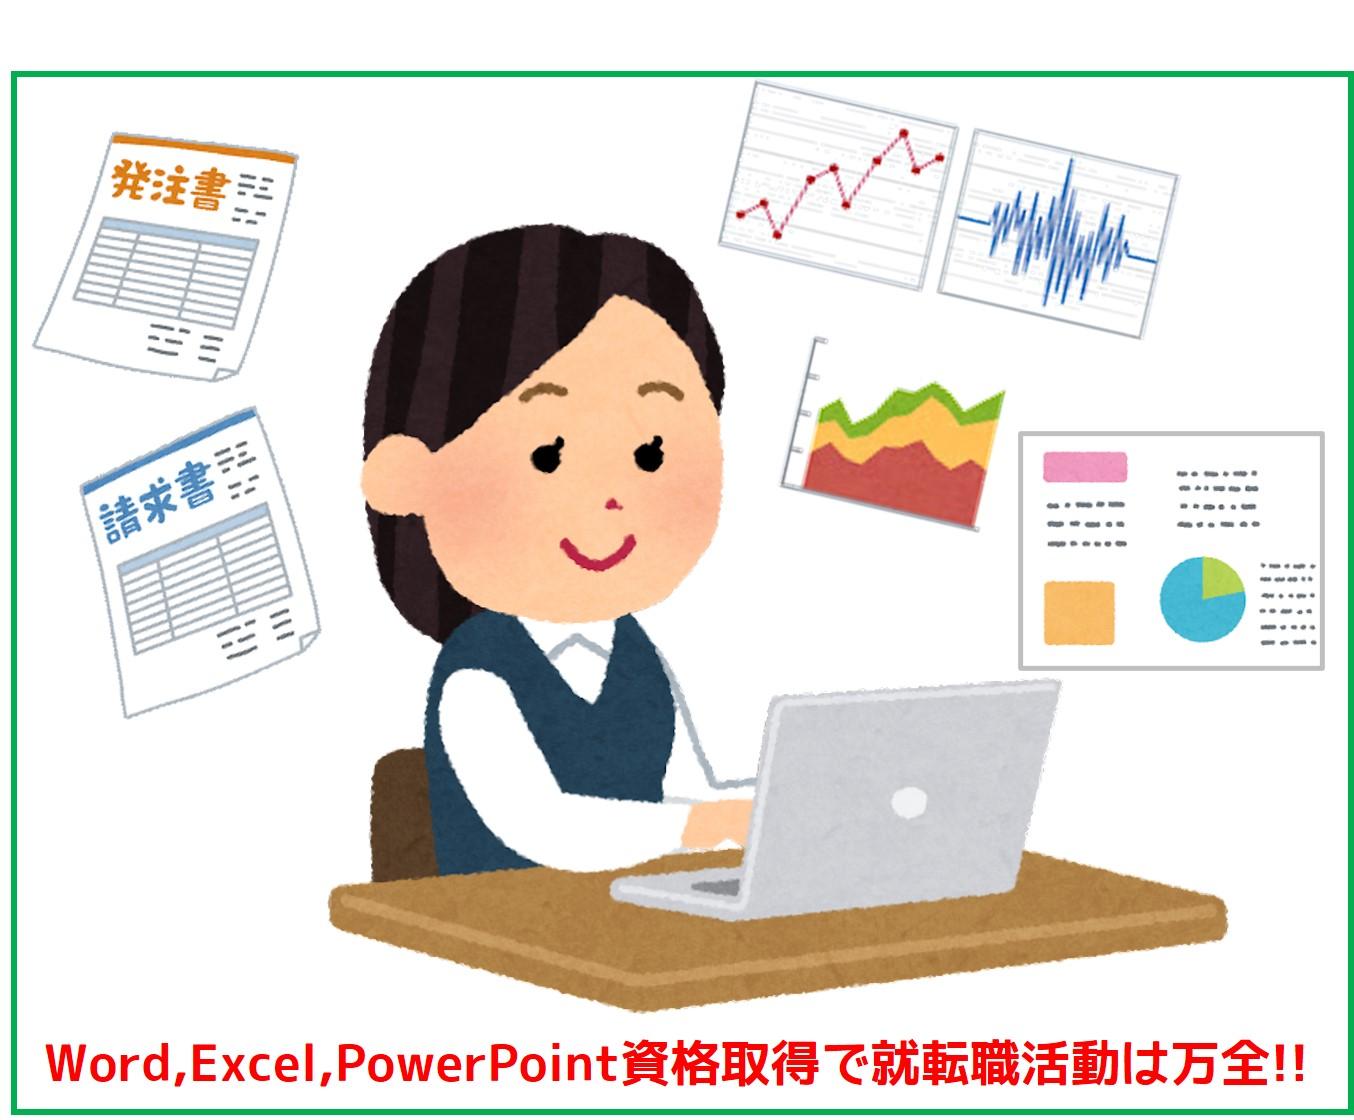 Word,Excel,PowerPoint資格取得で就転職活動は万全